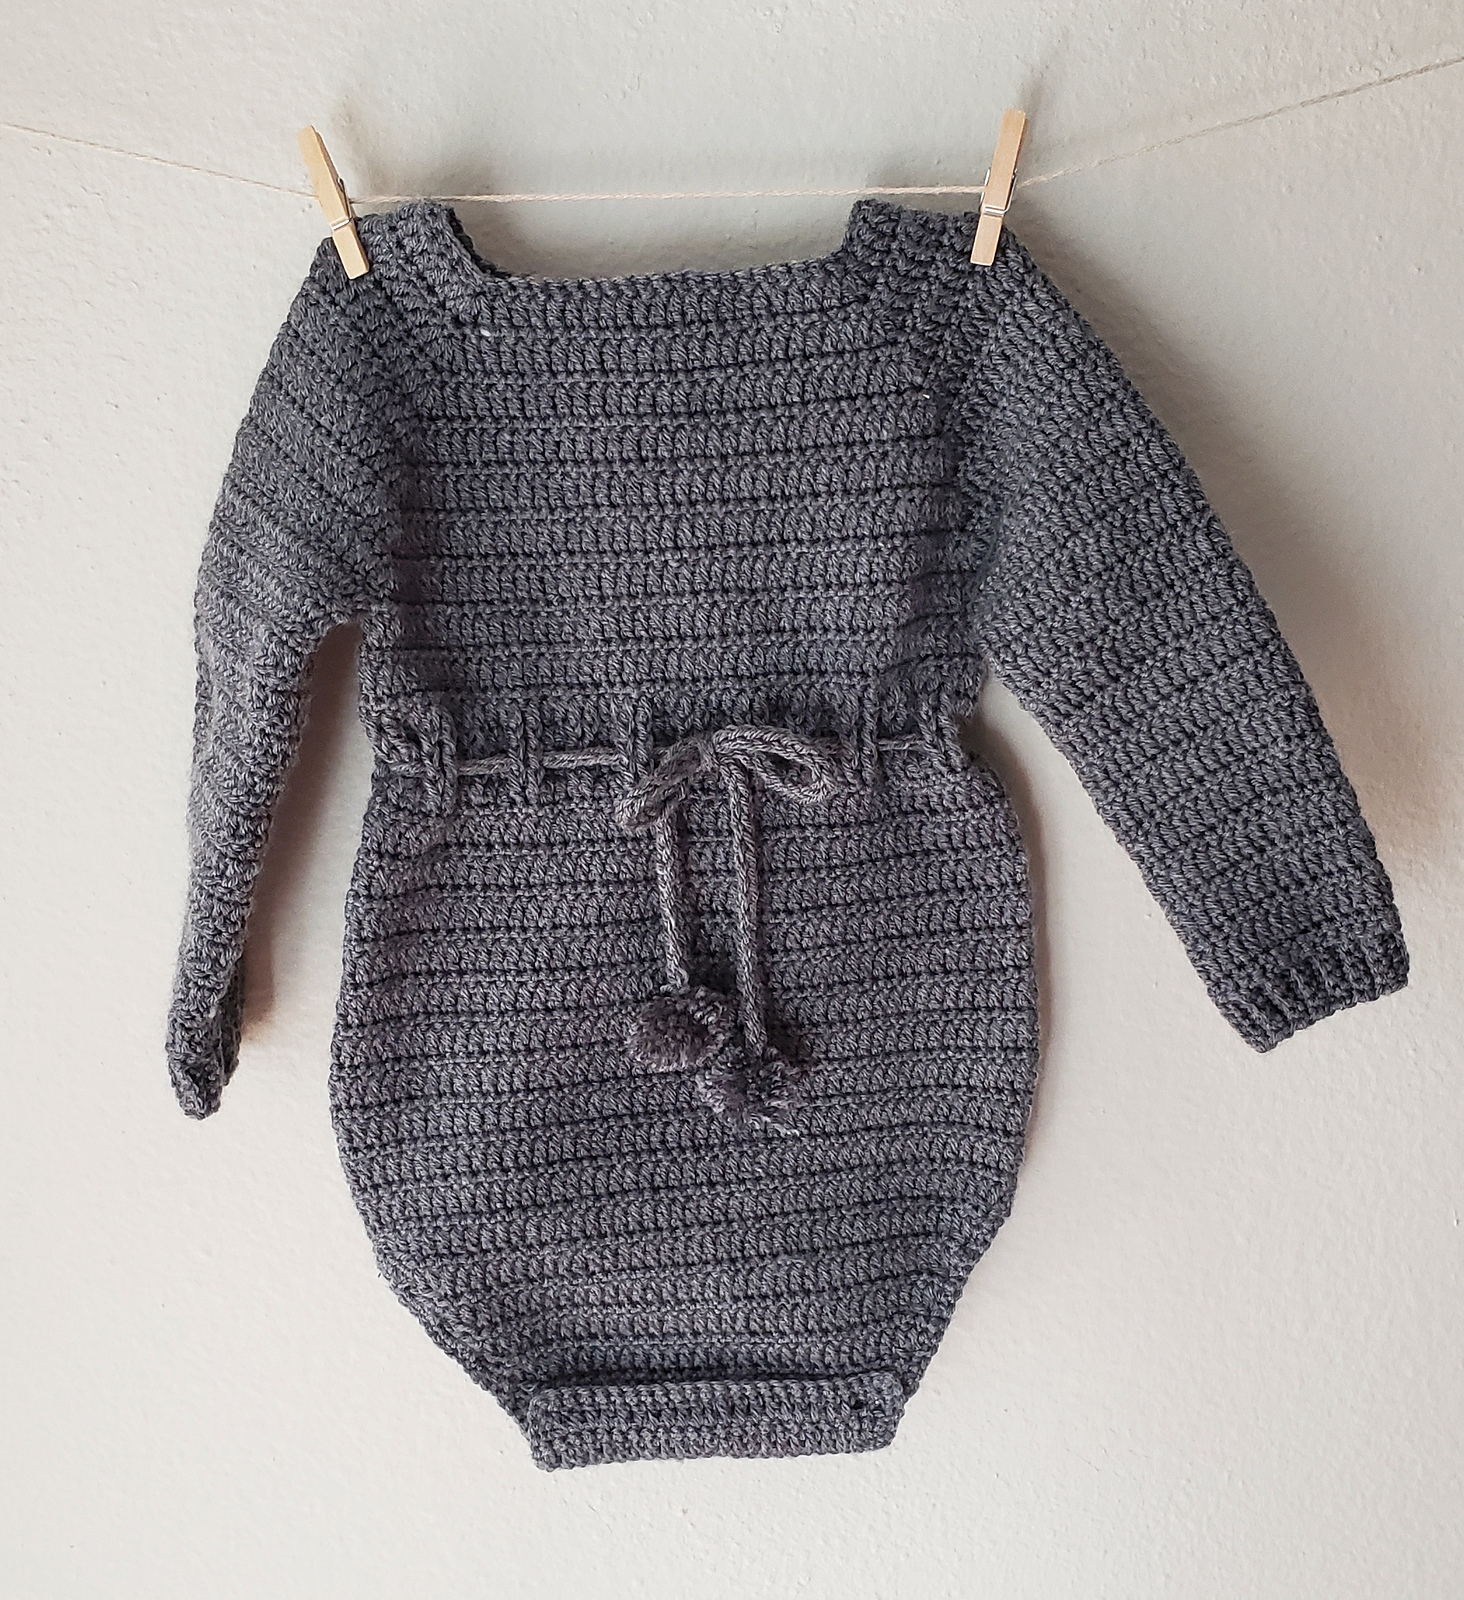 52-free-beautiful-baby-knitting-crochet-patterns-for-2019